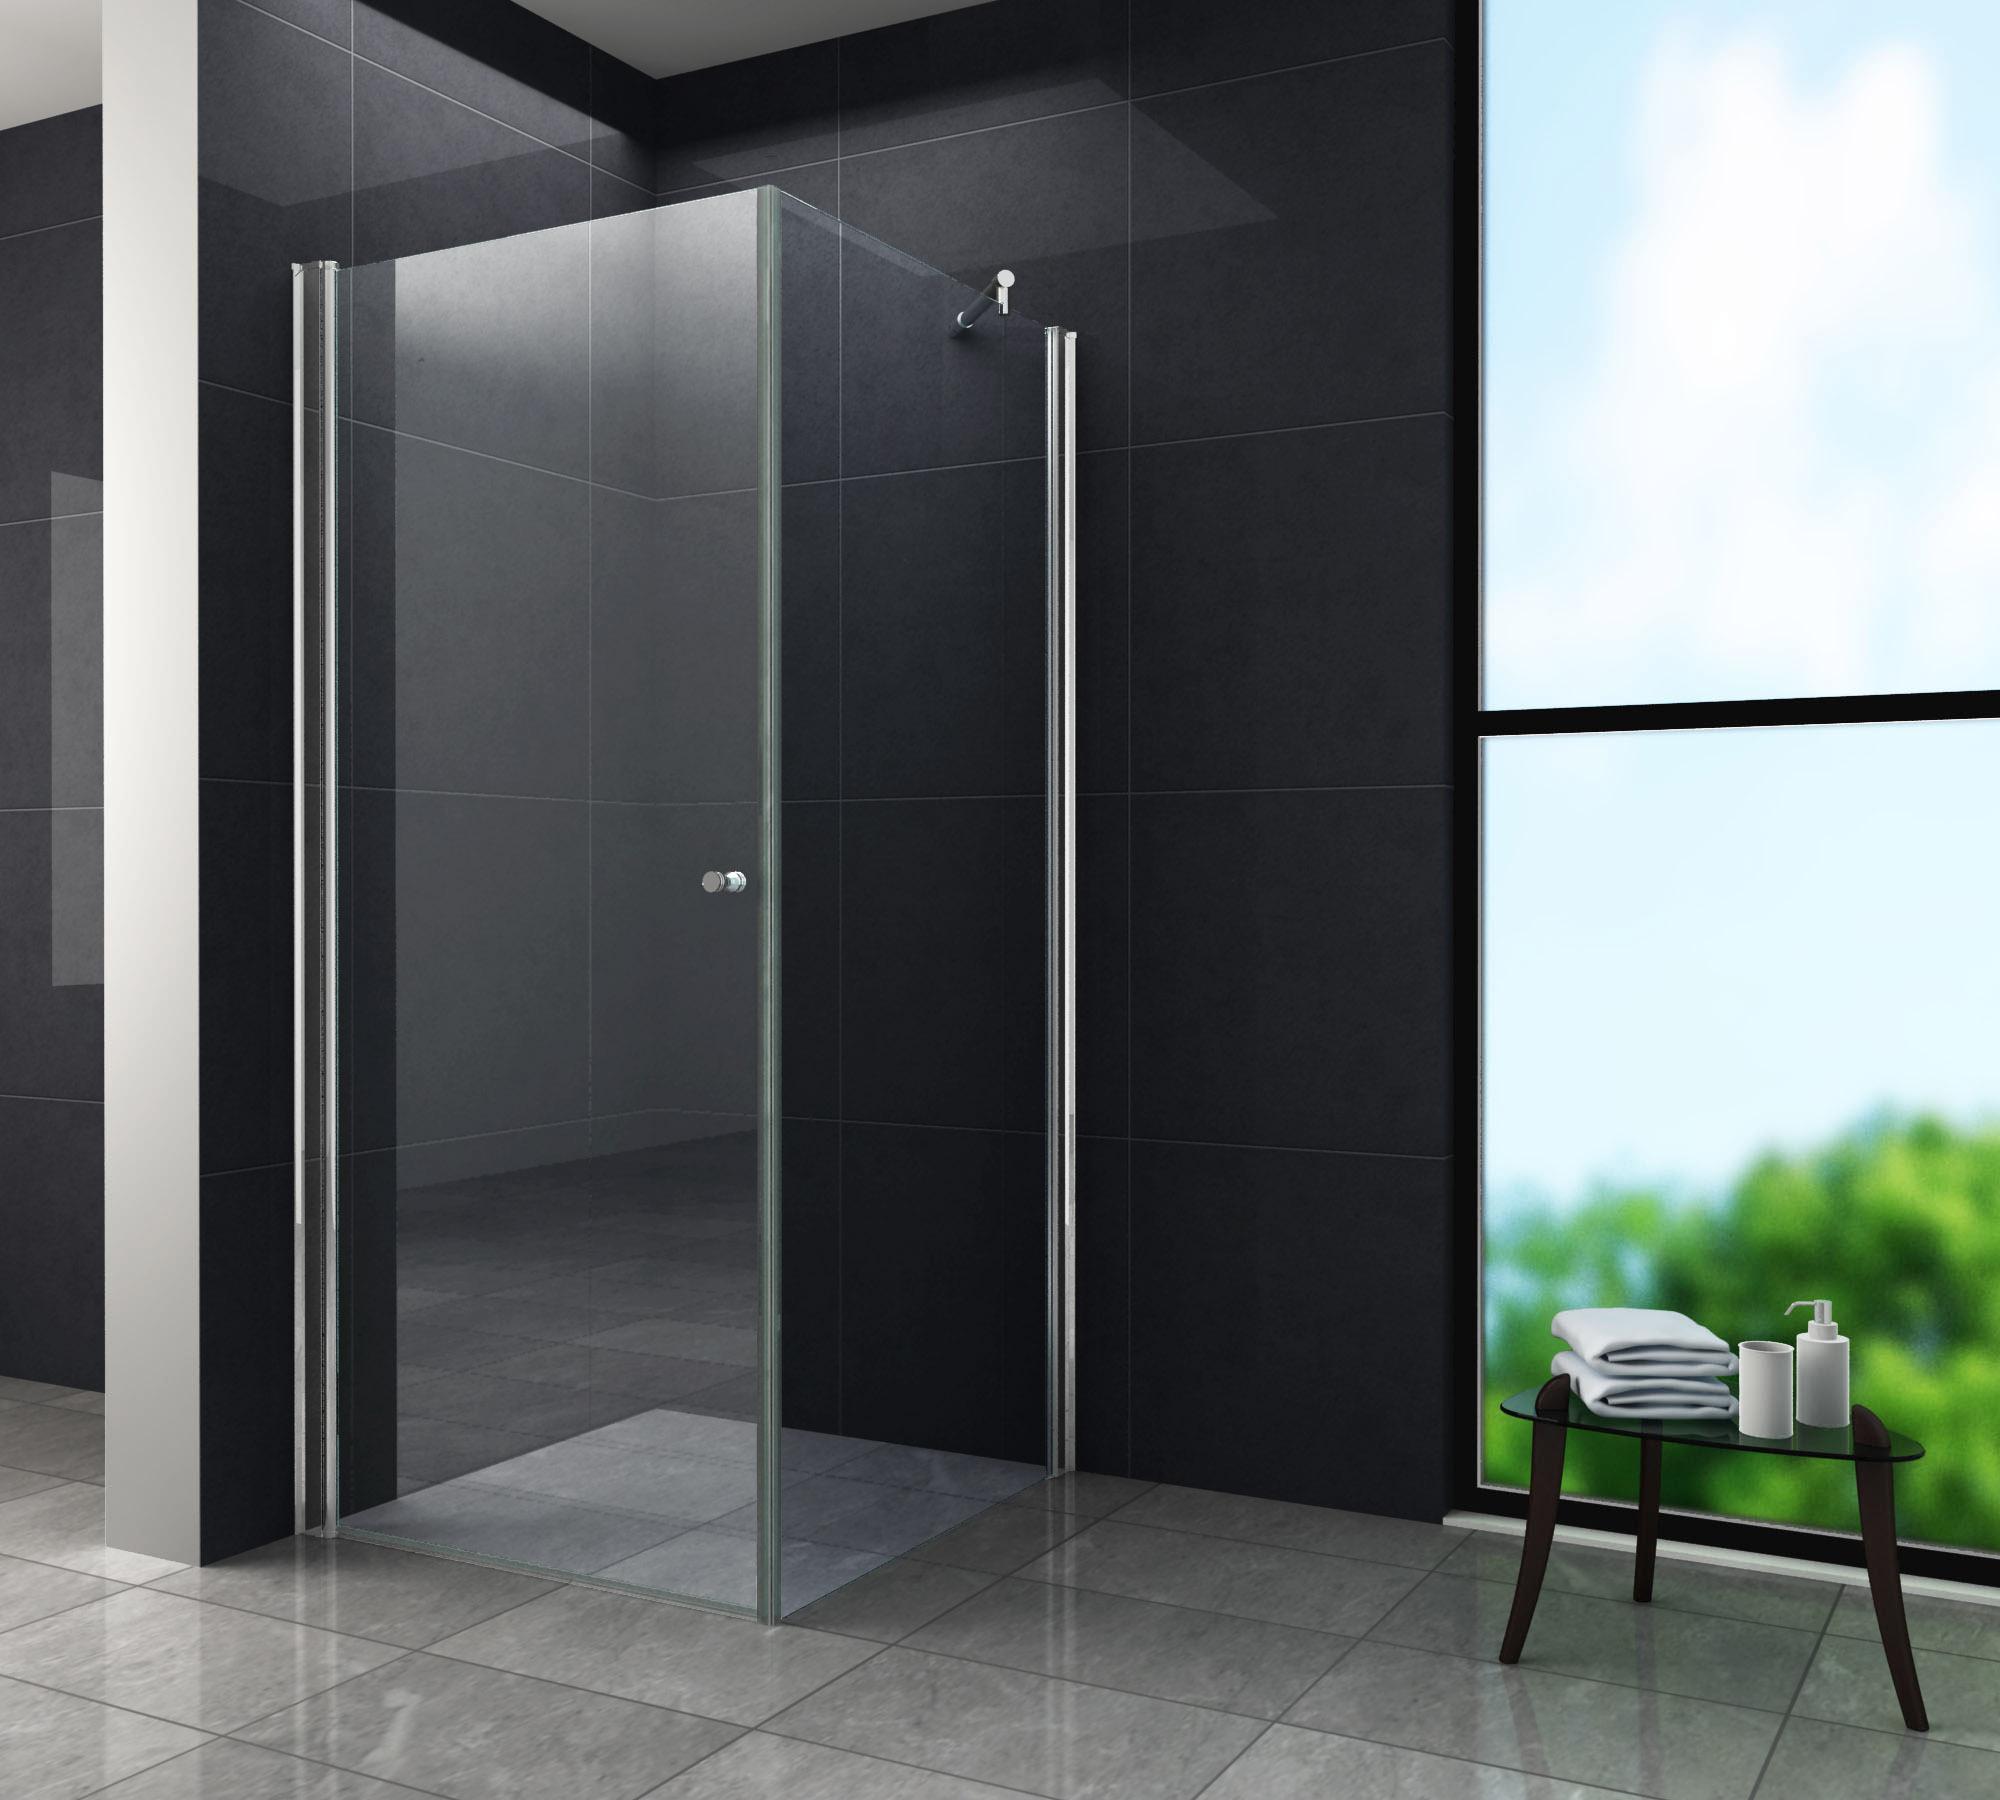 Duschkabine SPA-FIX 90 x 90 x 190 cm ohne Duschtasse